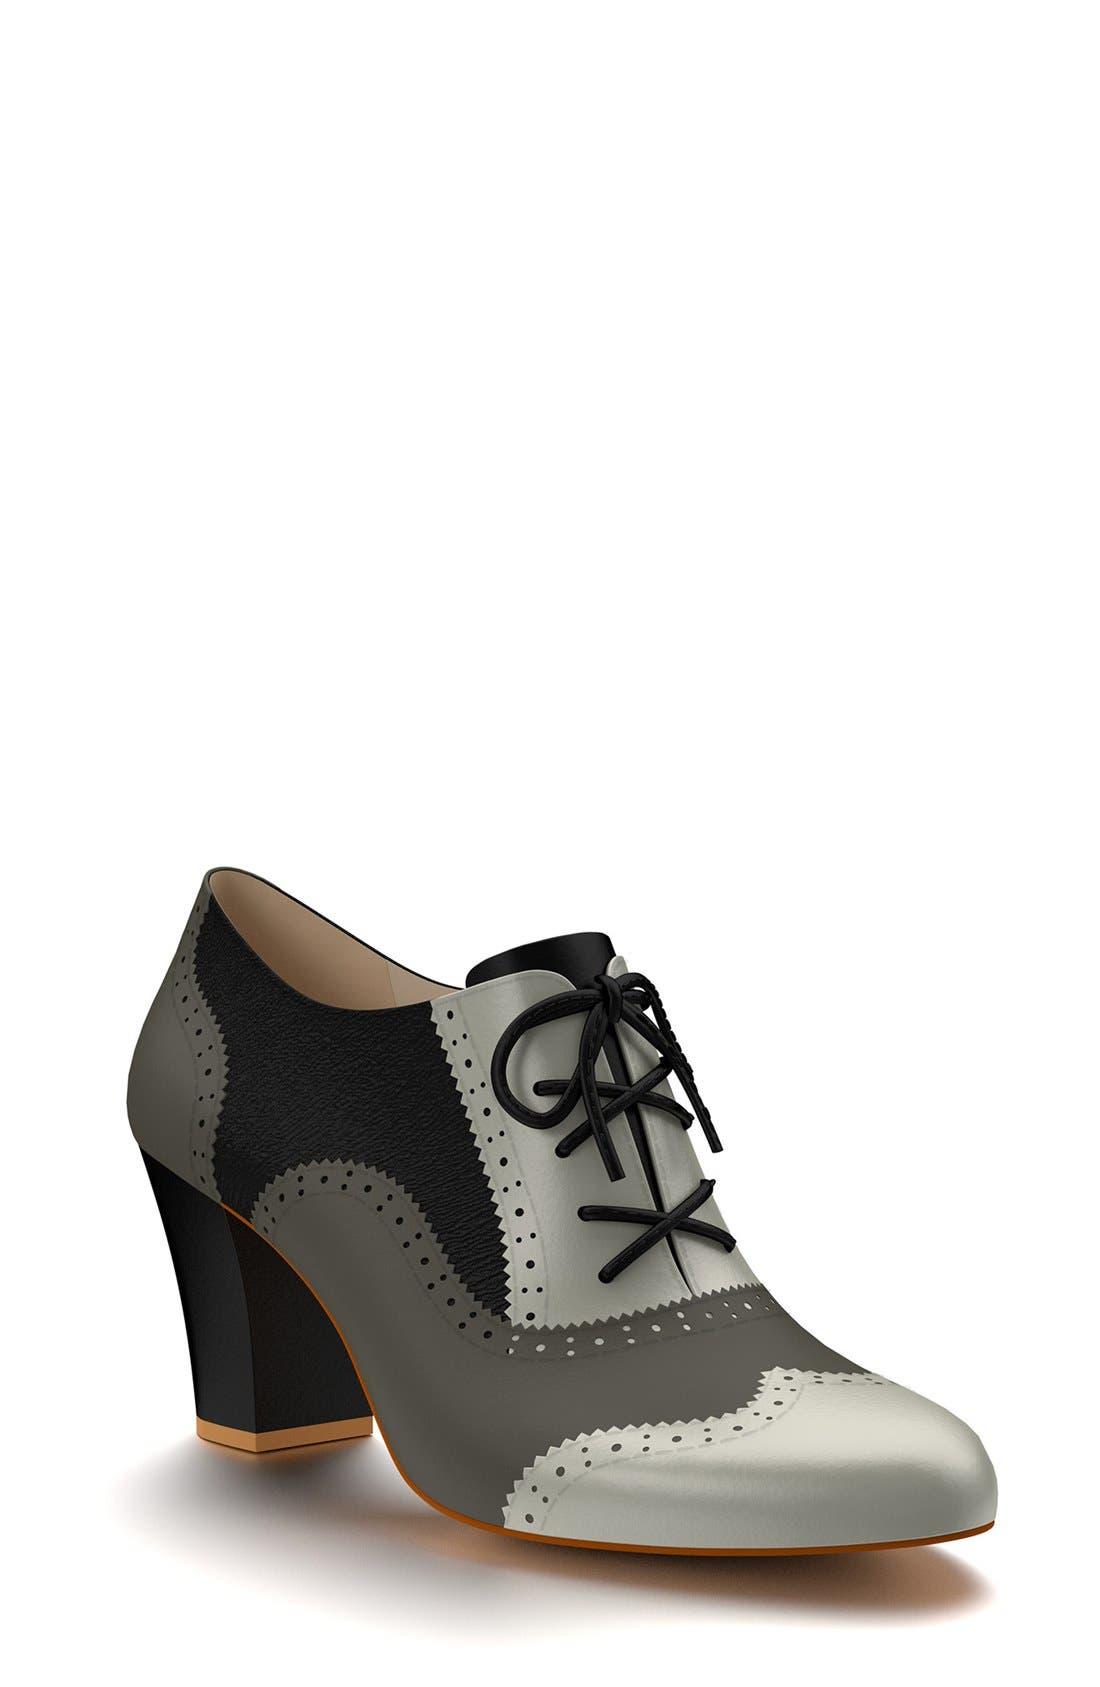 Main Image - Shoes of Prey Colorblock Genuine Calf Hair Oxford Bootie (Women)